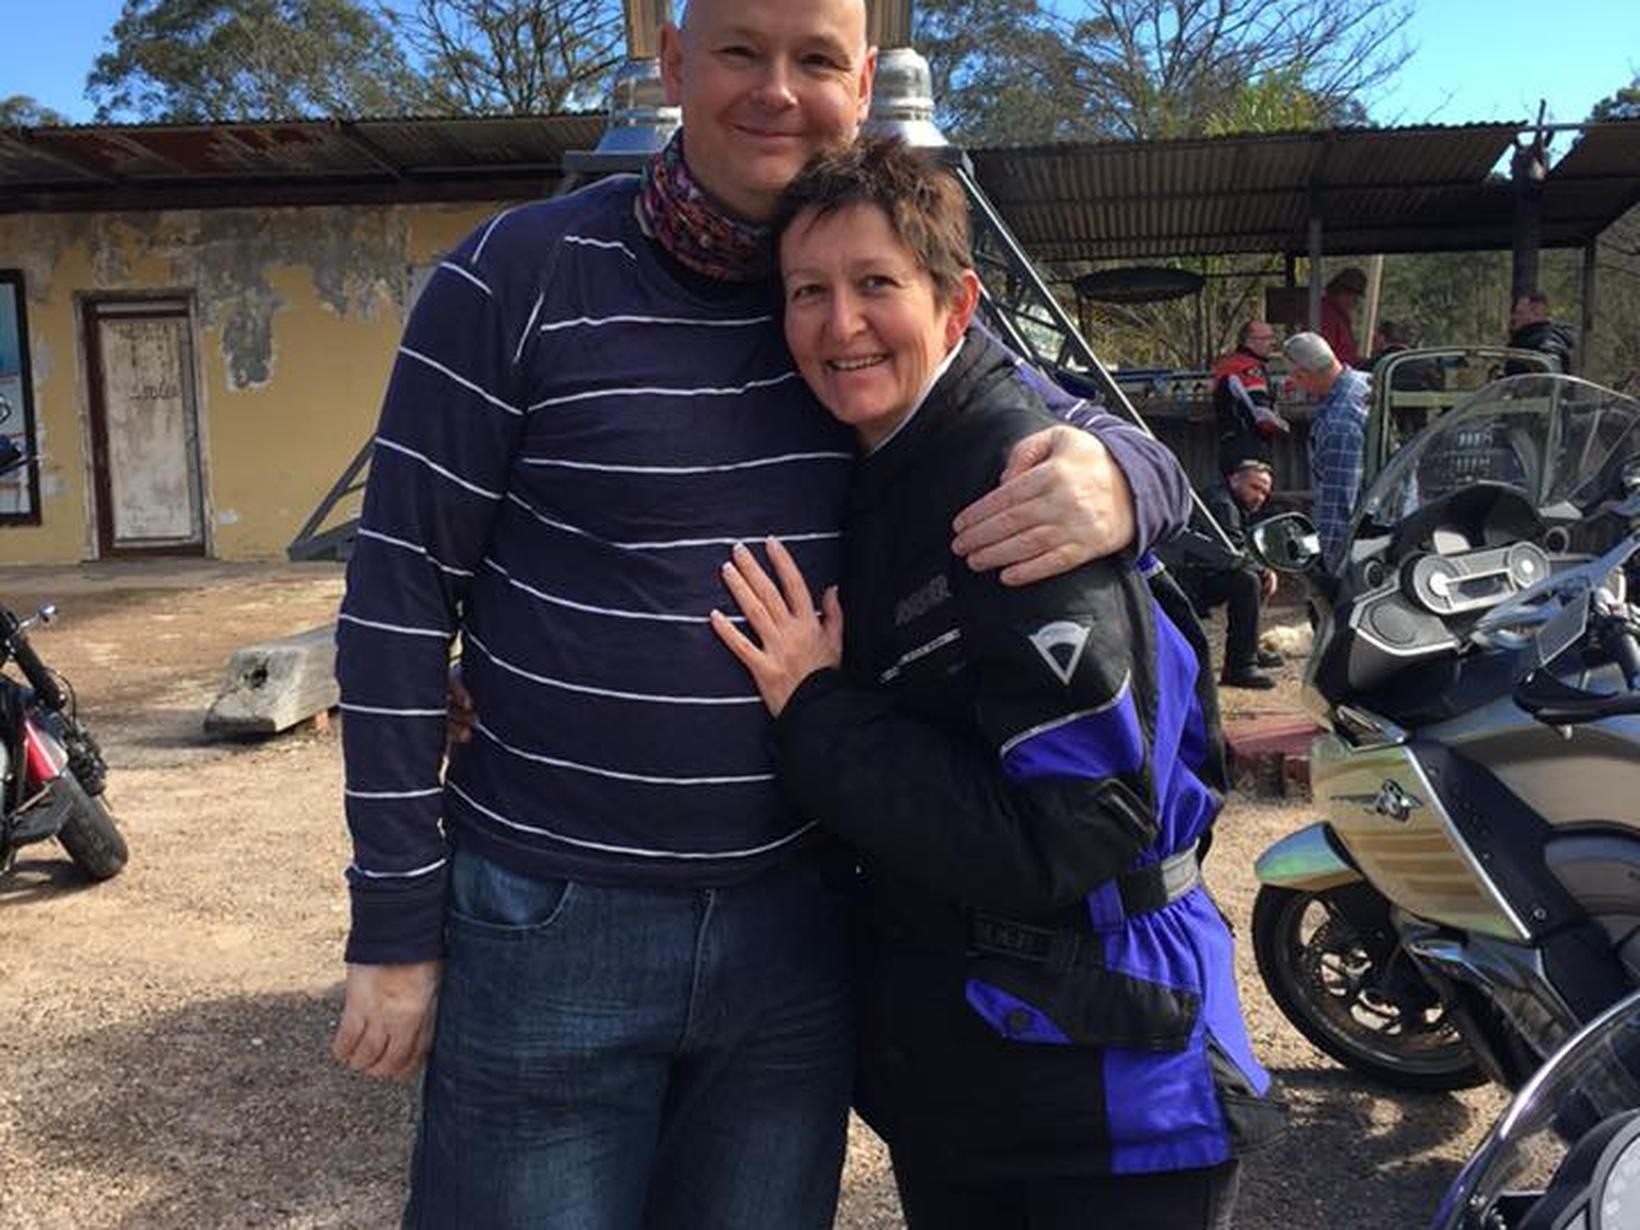 Maryna & Paul from Sydney, New South Wales, Australia